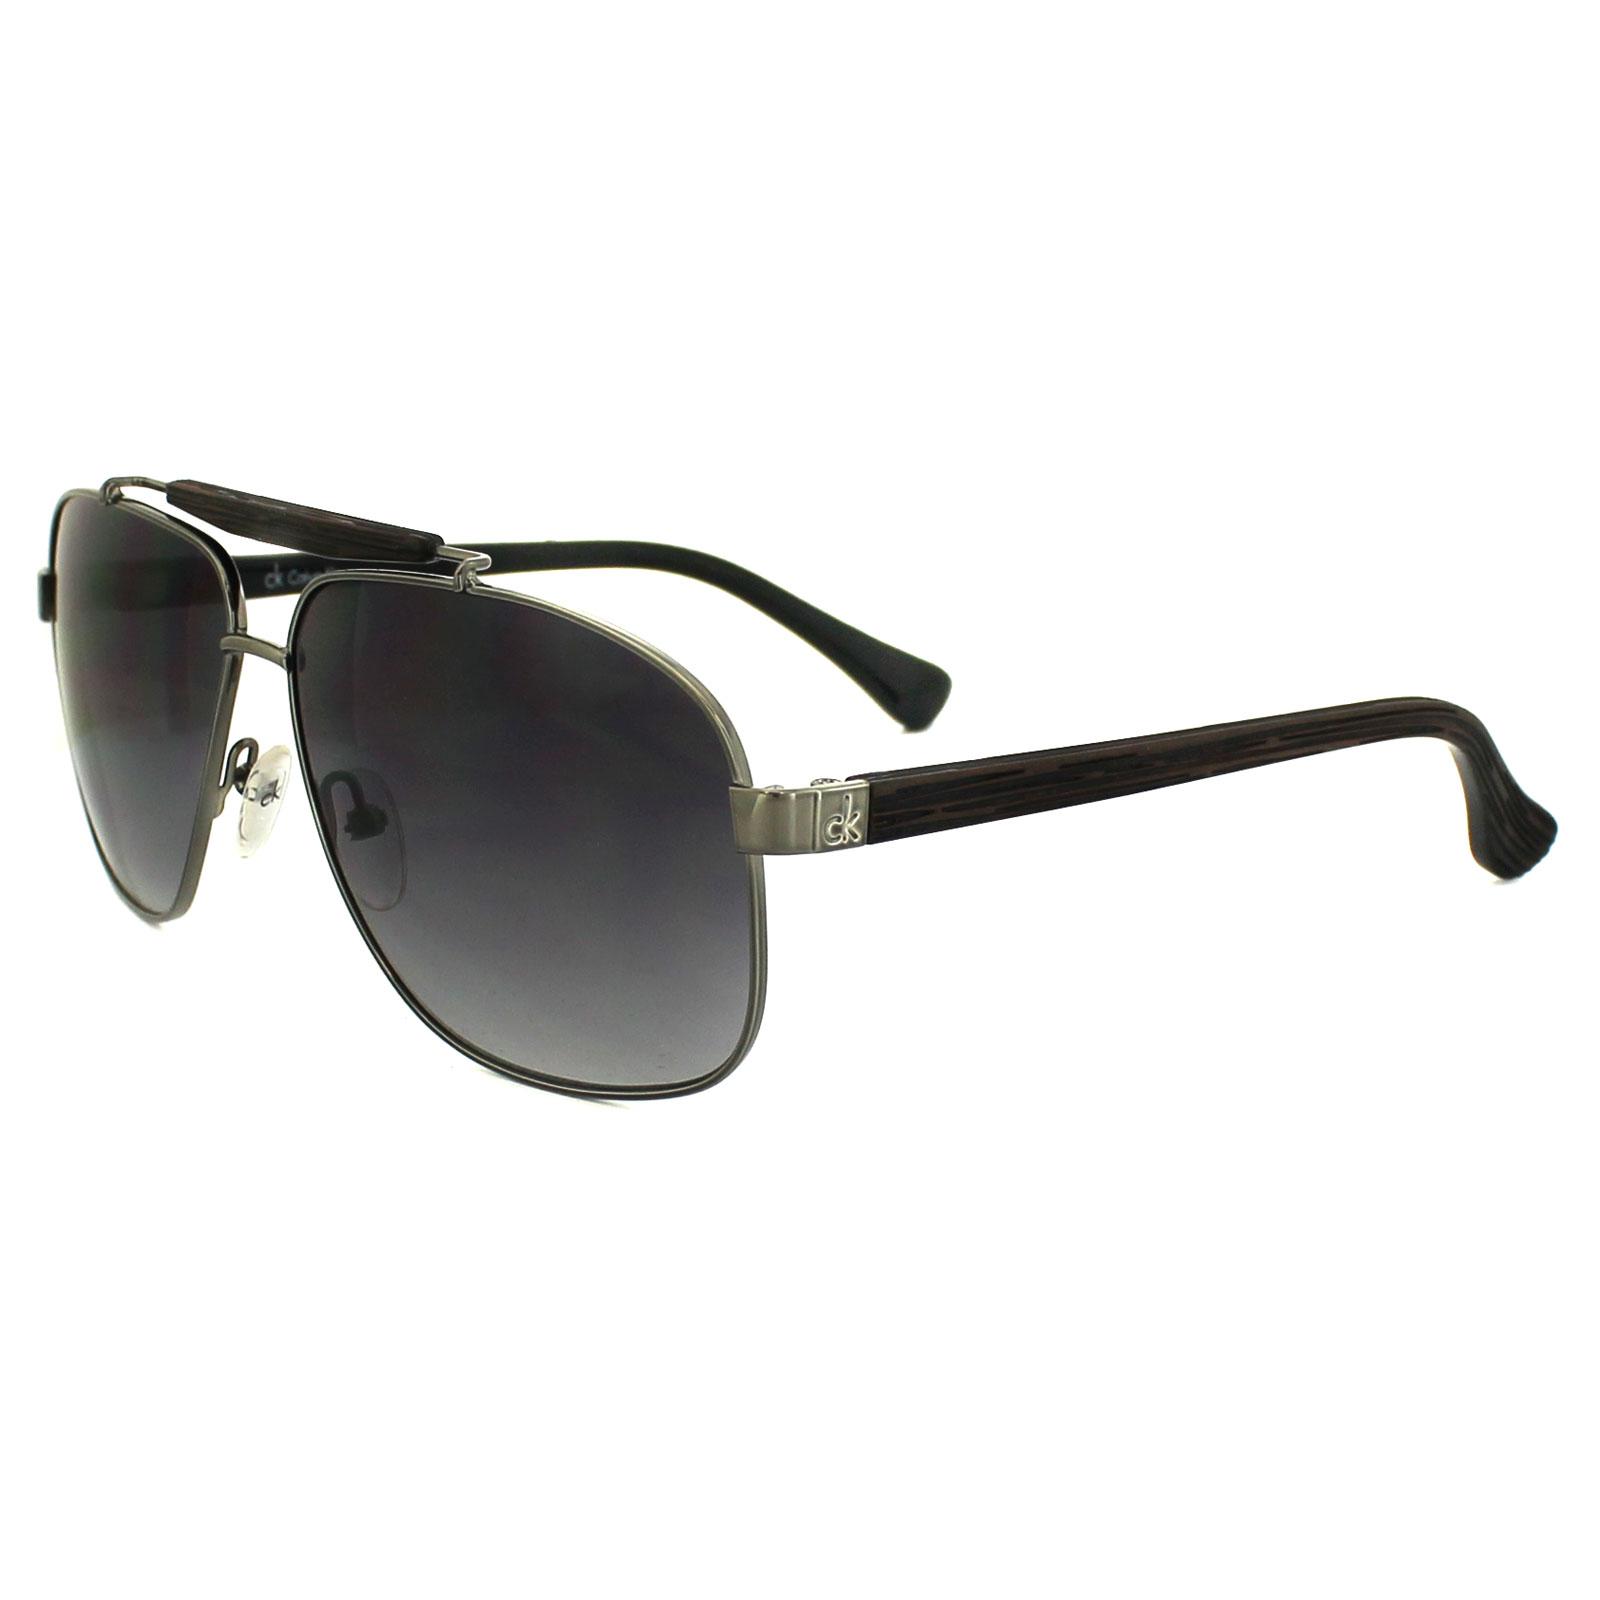 ac49694c2 Calvin Klein Sunglasses 1187 031 Iron Brown Brown Gradient ...